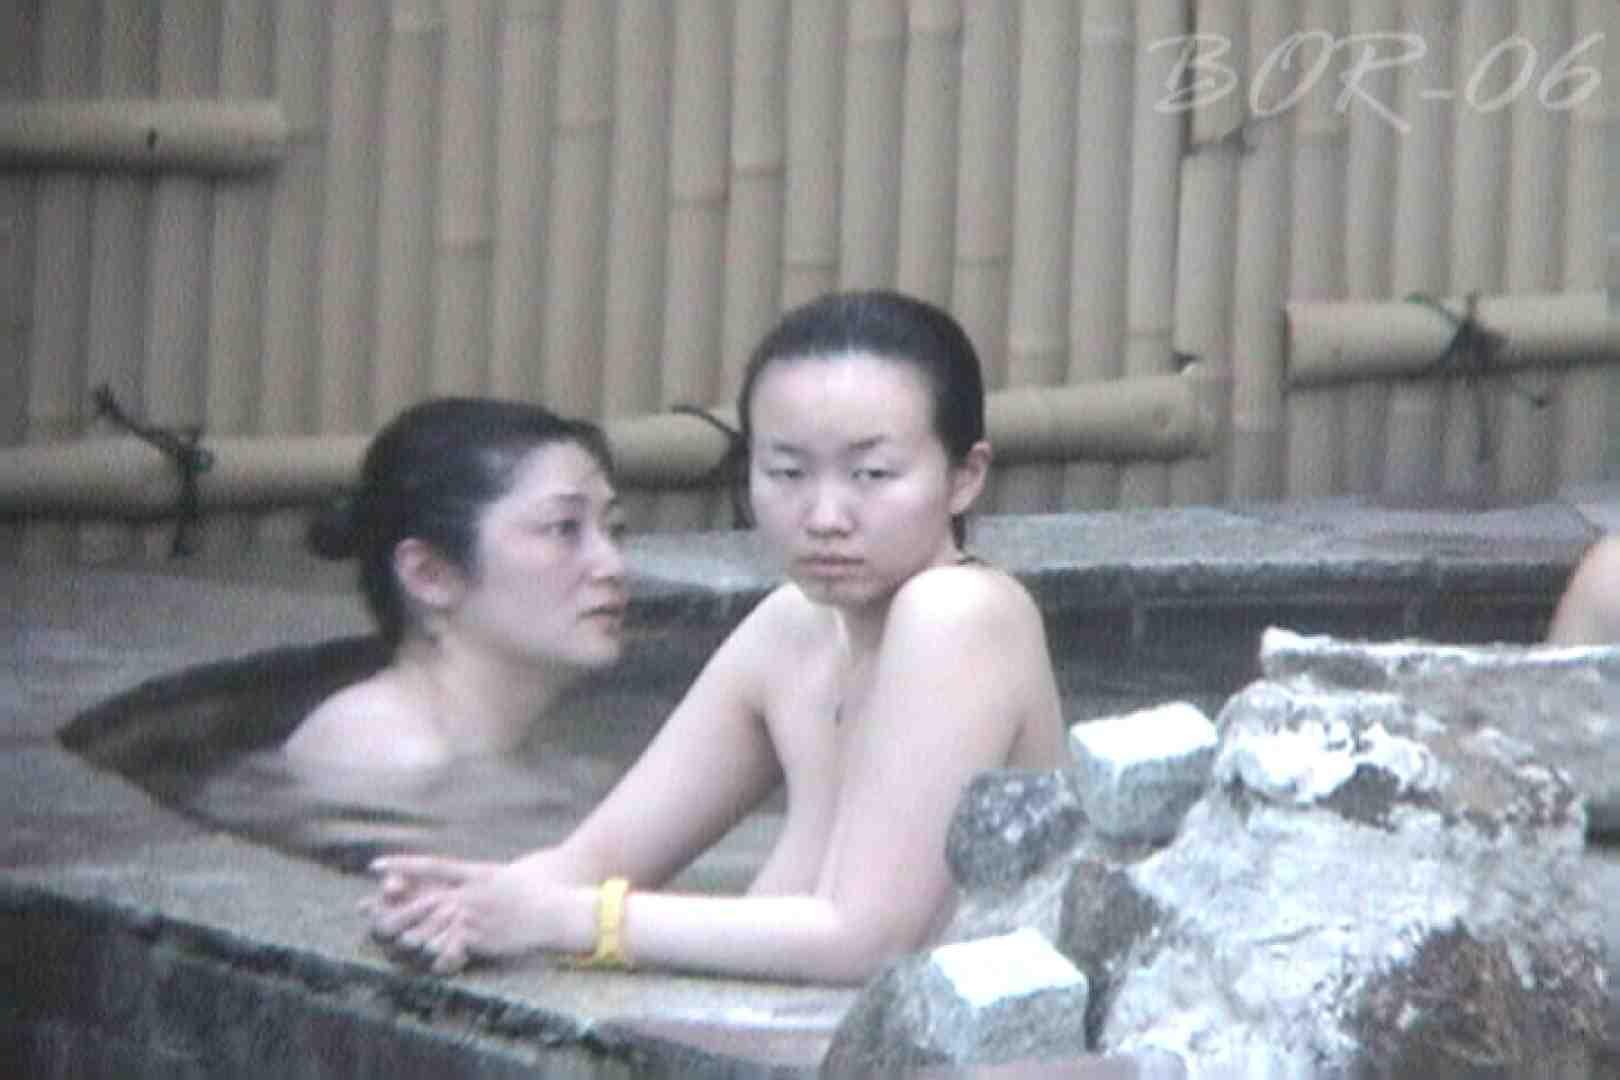 Aquaな露天風呂Vol.519 盗撮師作品  102pic 6